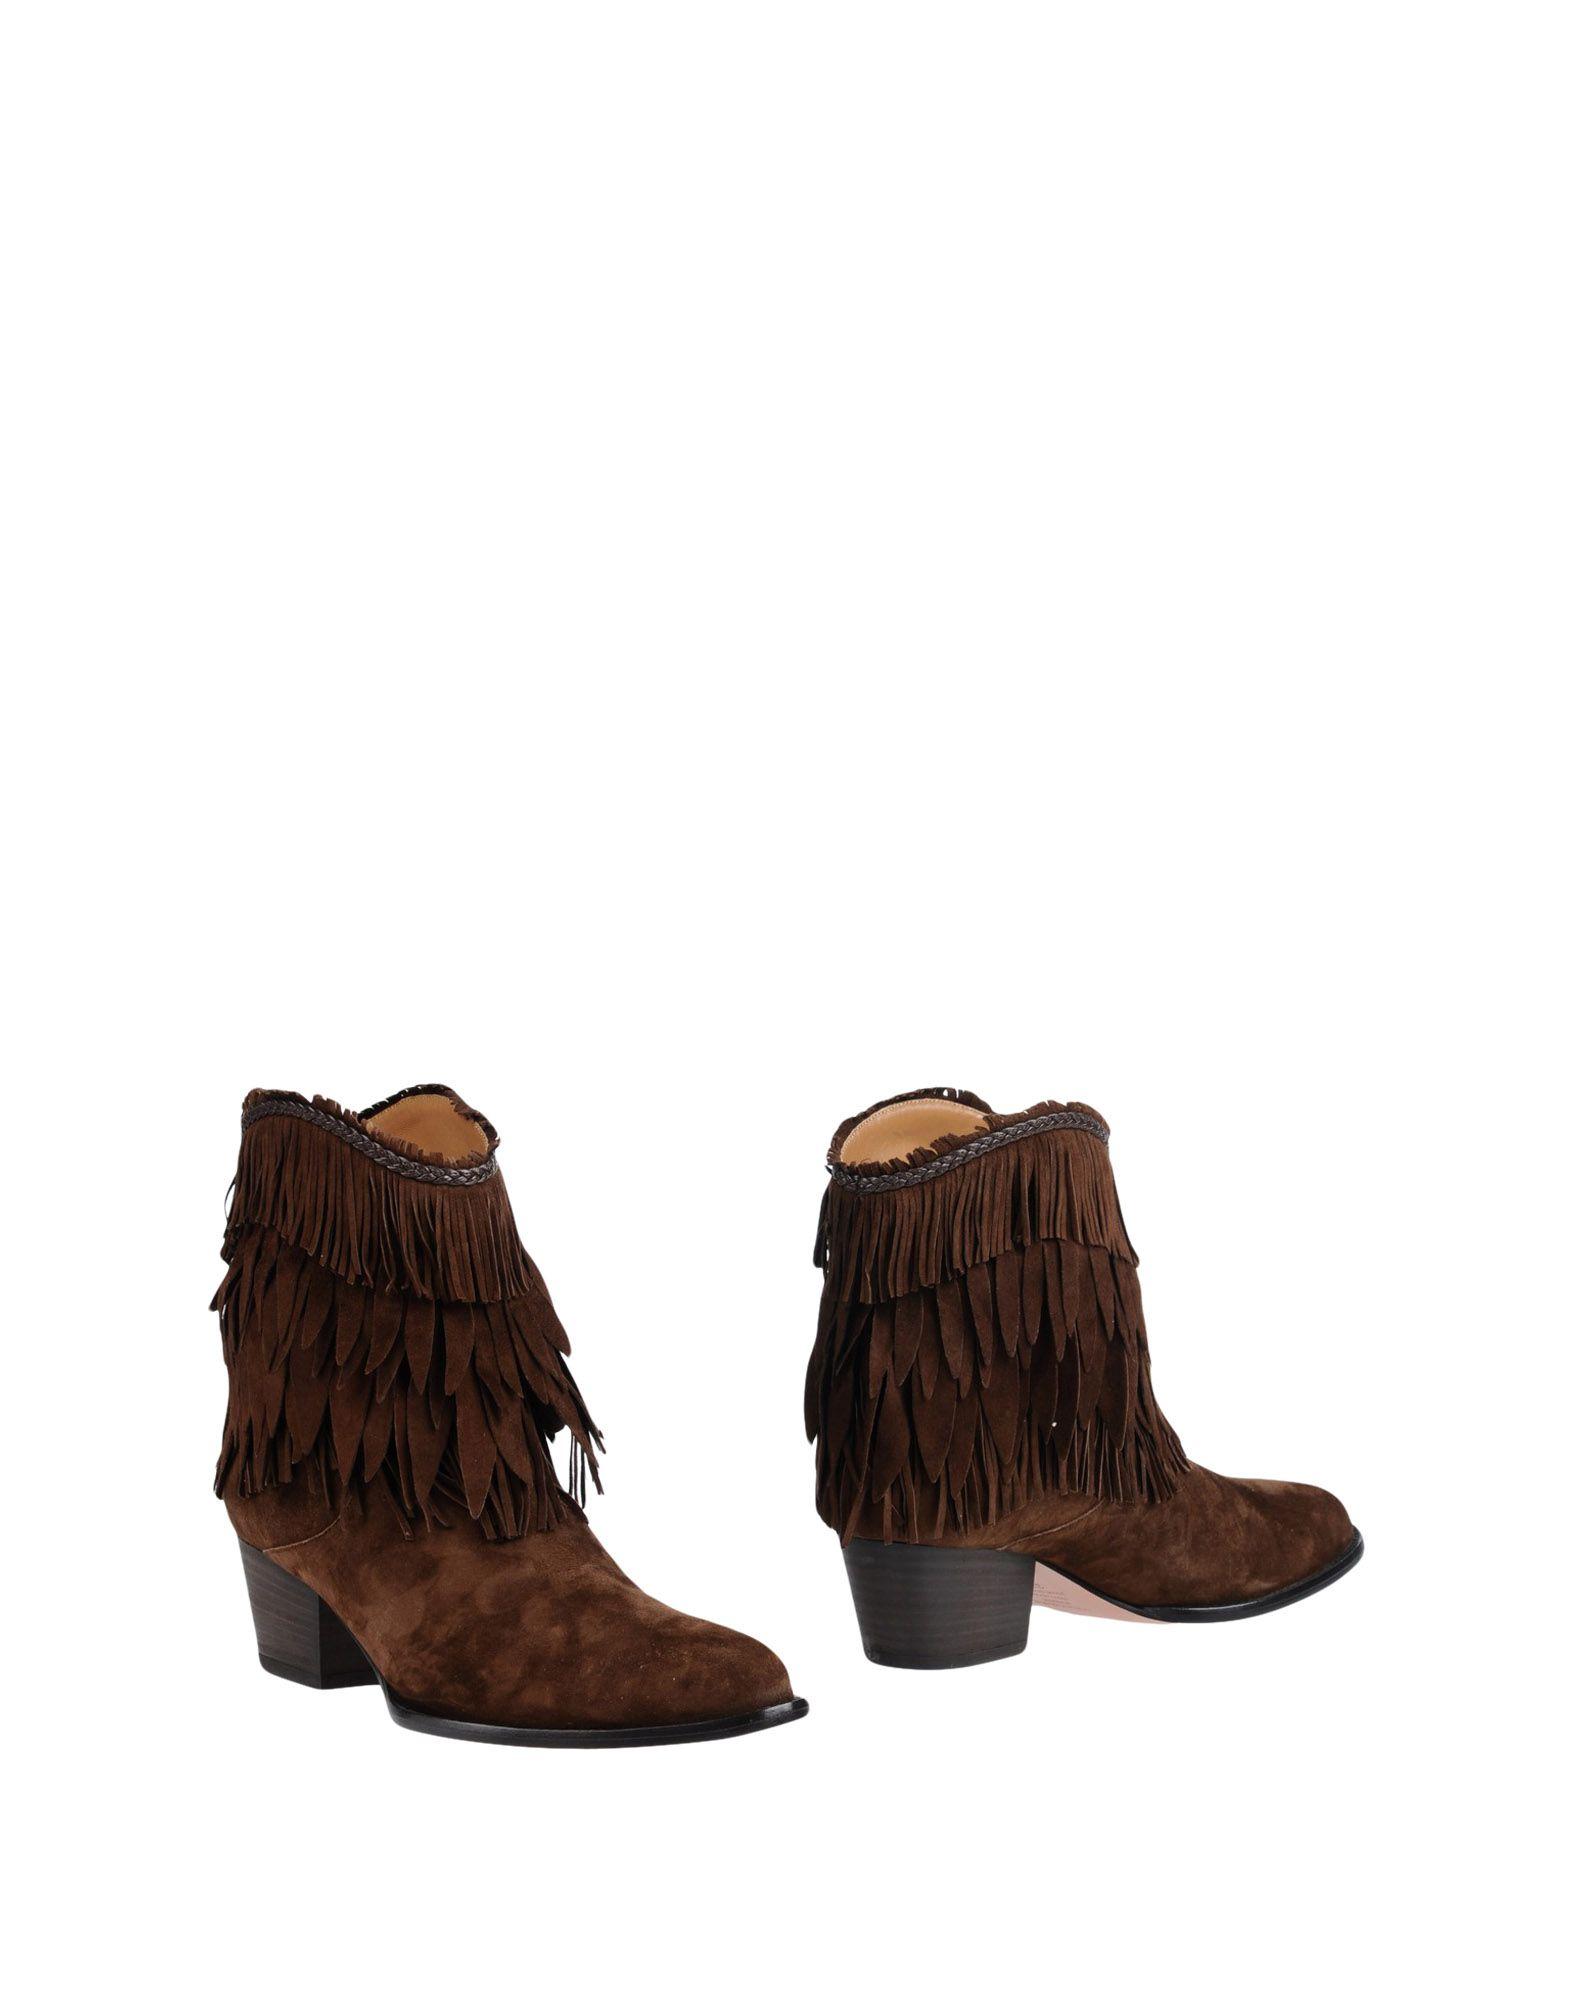 Фото - AQUAZZURA Полусапоги и высокие ботинки aquazzura золотистые босоножки sandance plateau 140